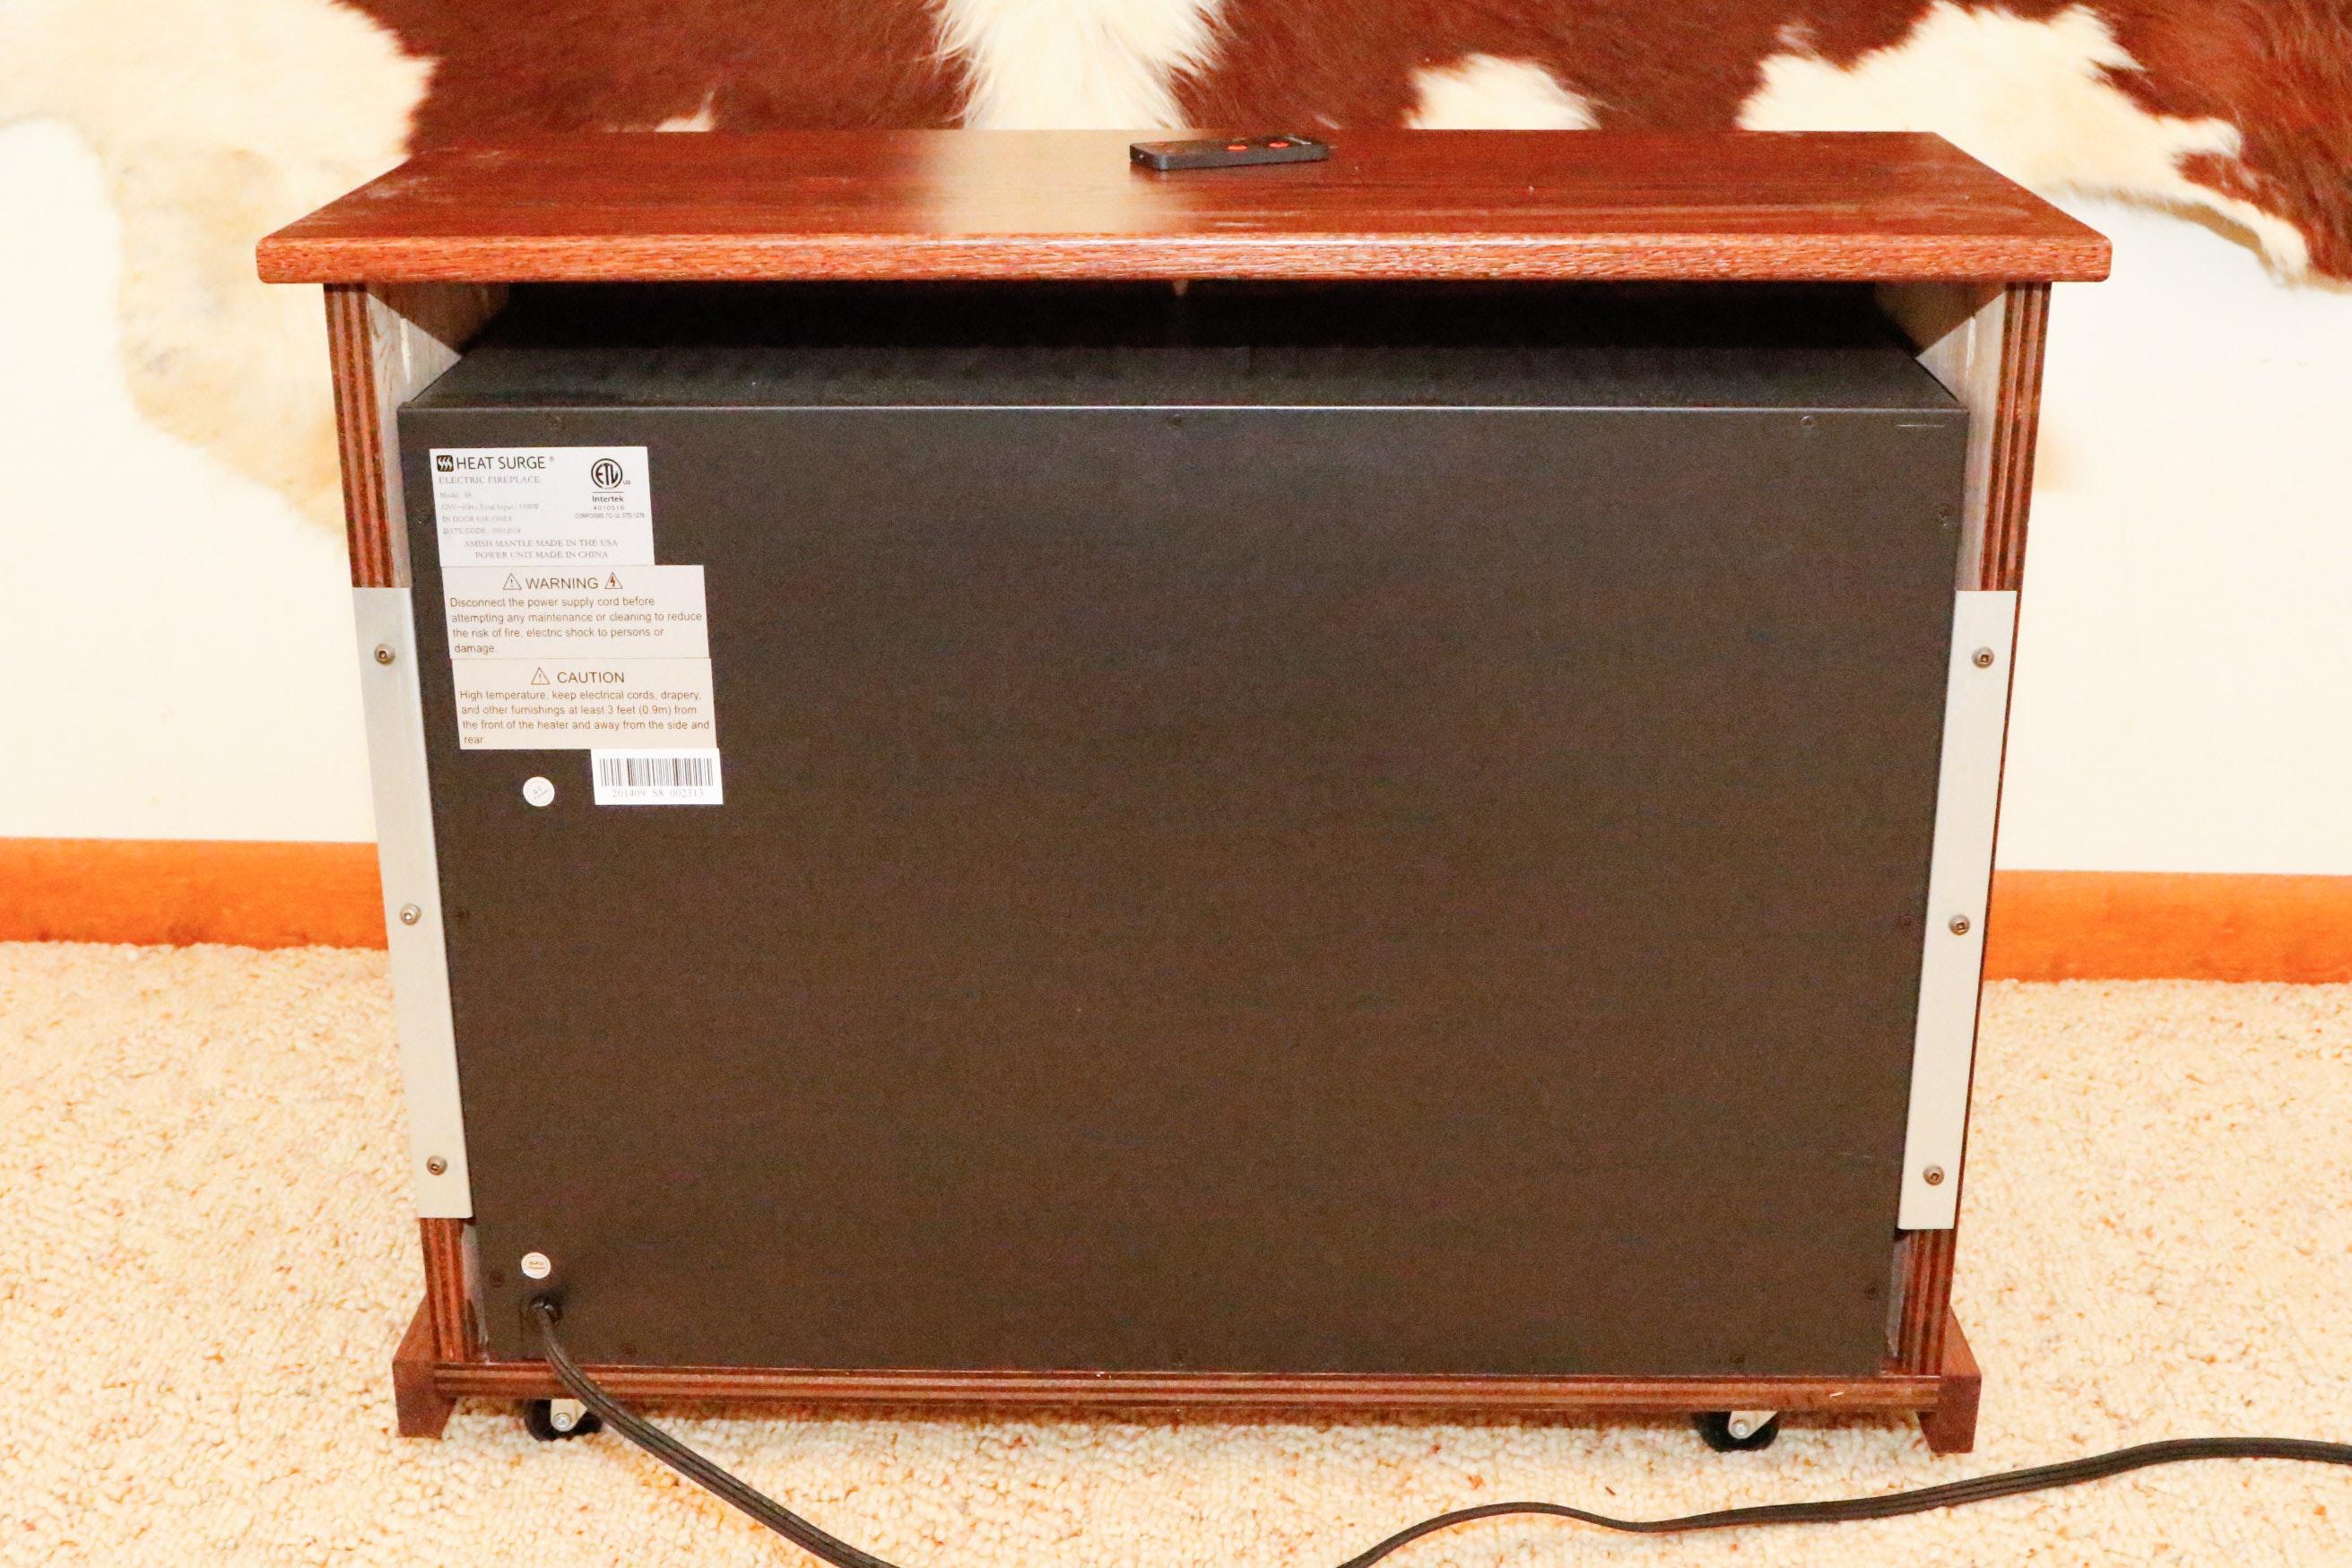 Heat Surge Electric Fireplace Wiring Diagram Heat Surge Heater – Lb White Lp Heater Wiring Diagram